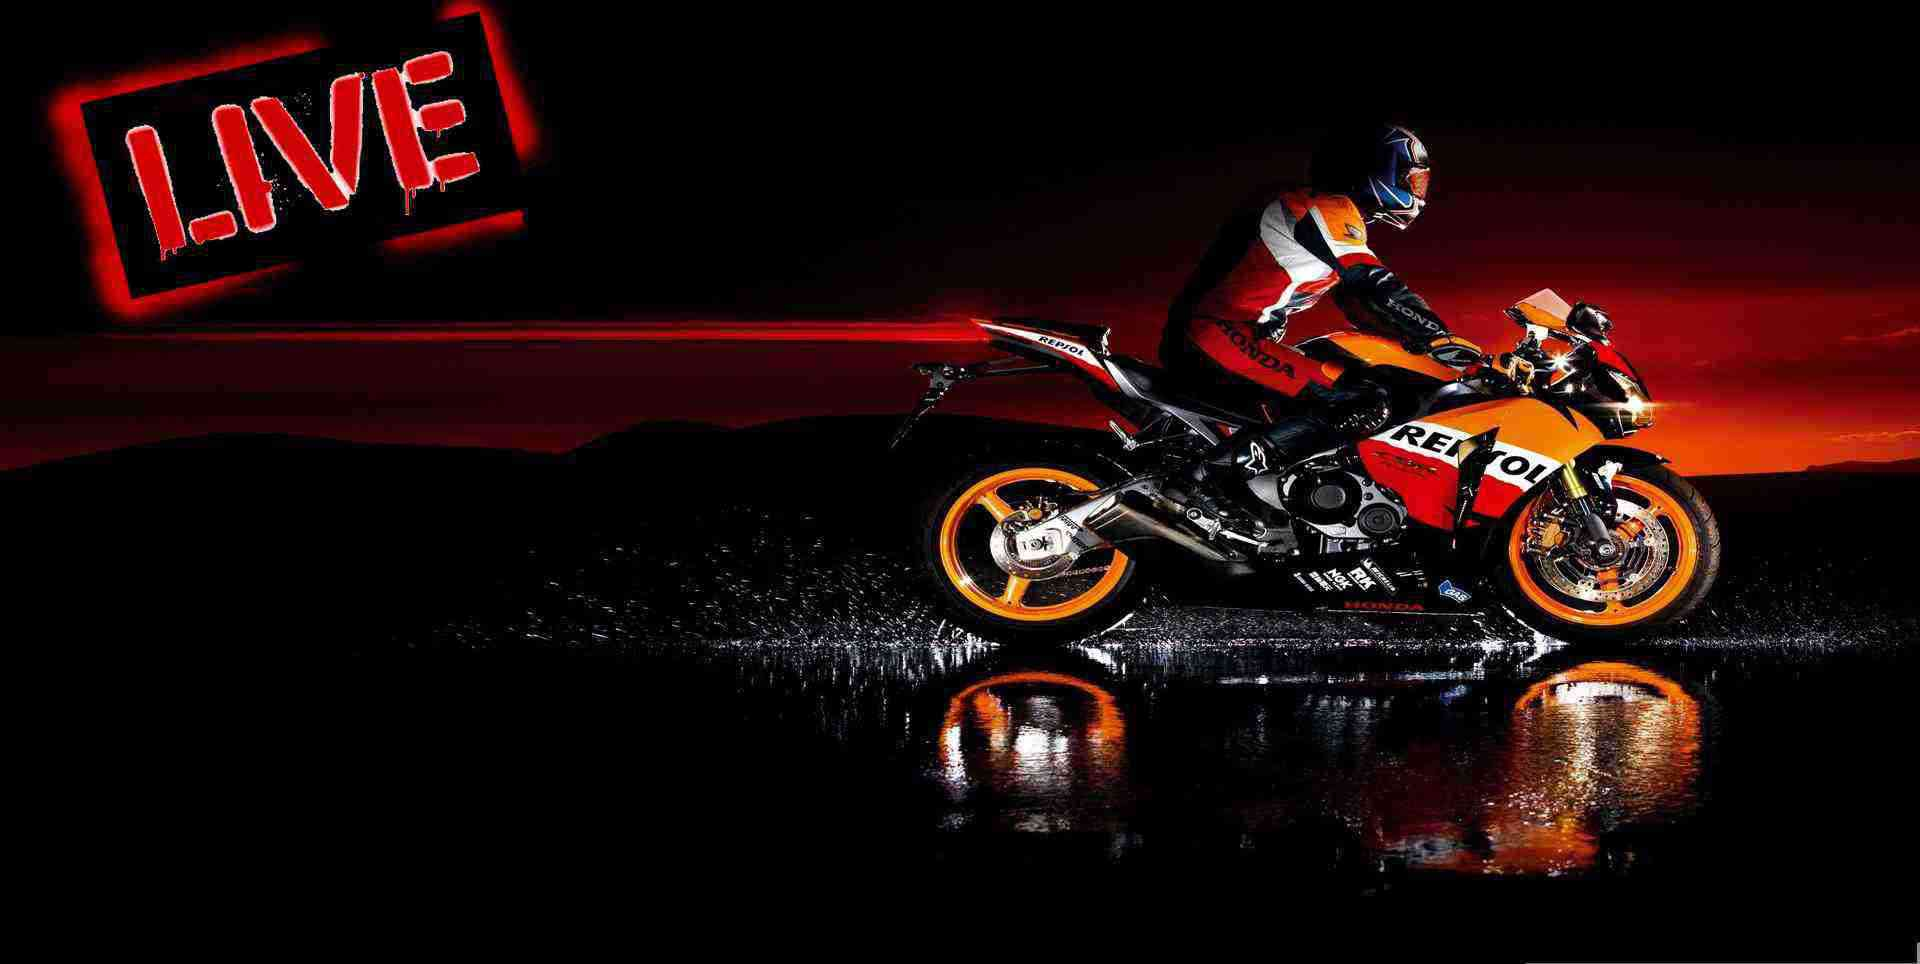 live-2014-italian-motorcycle-grand-prix-online